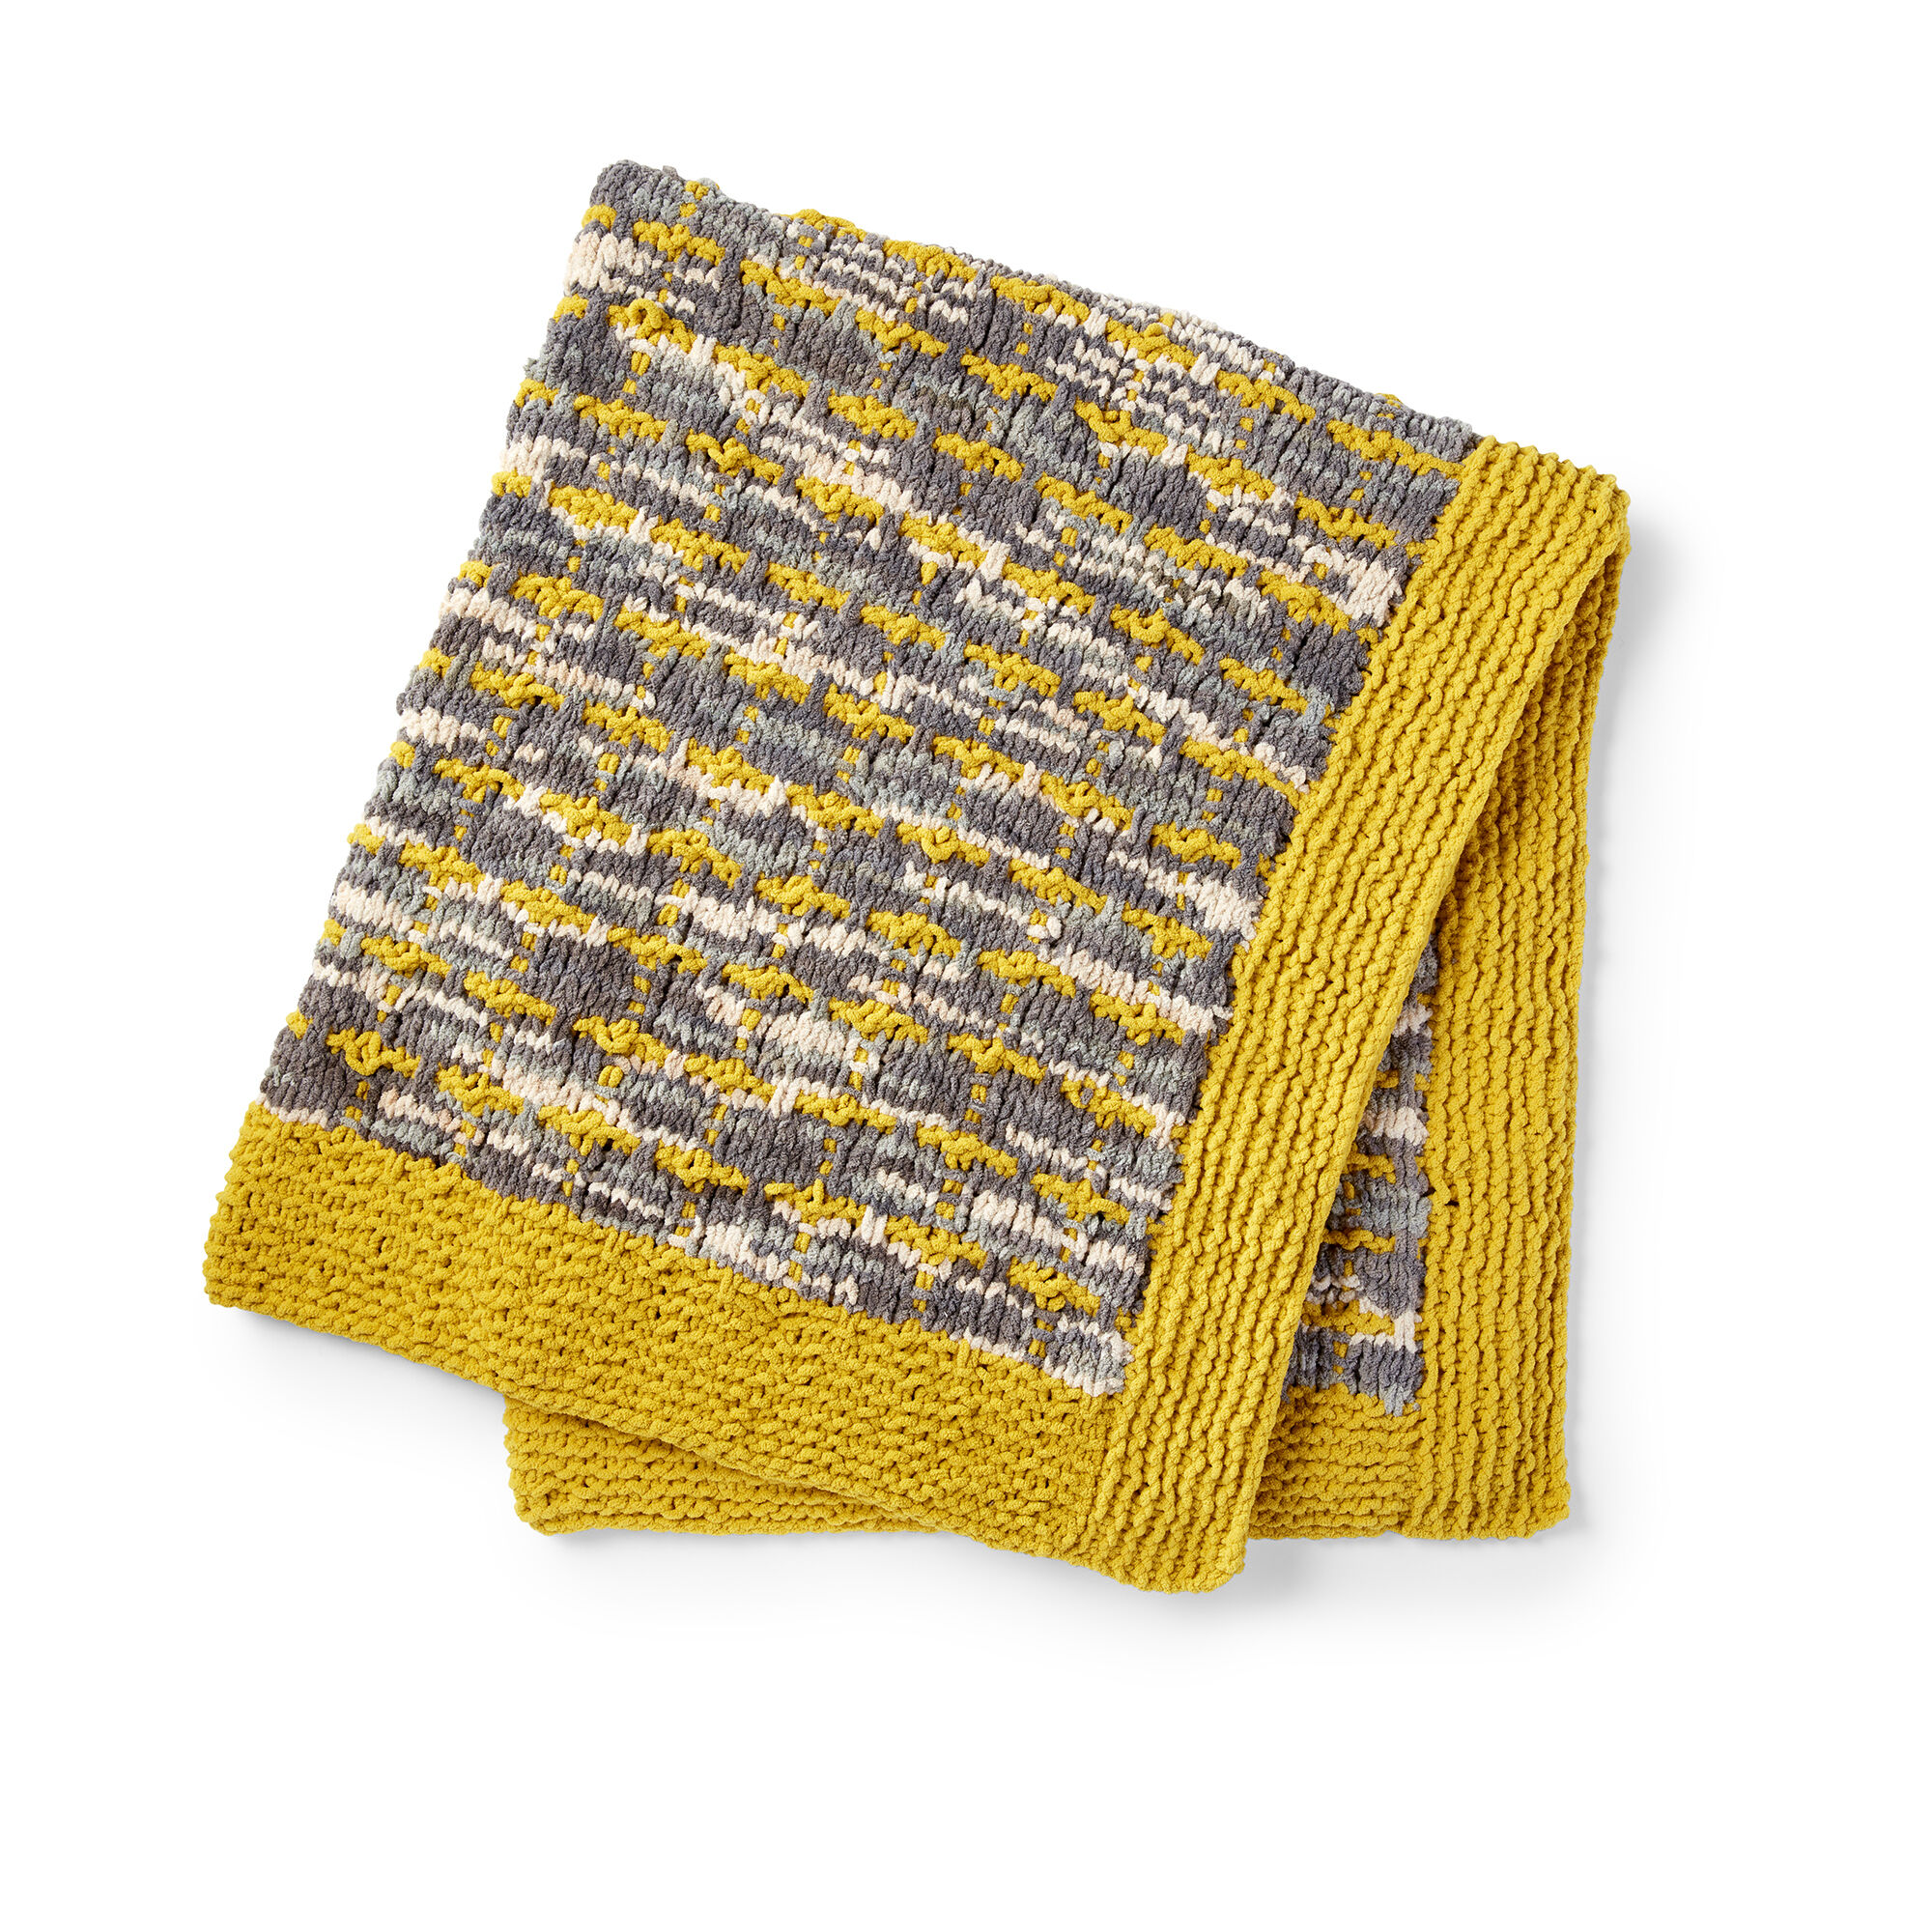 Bernat Gridline Knit Blanket Pattern   Yarnspirations